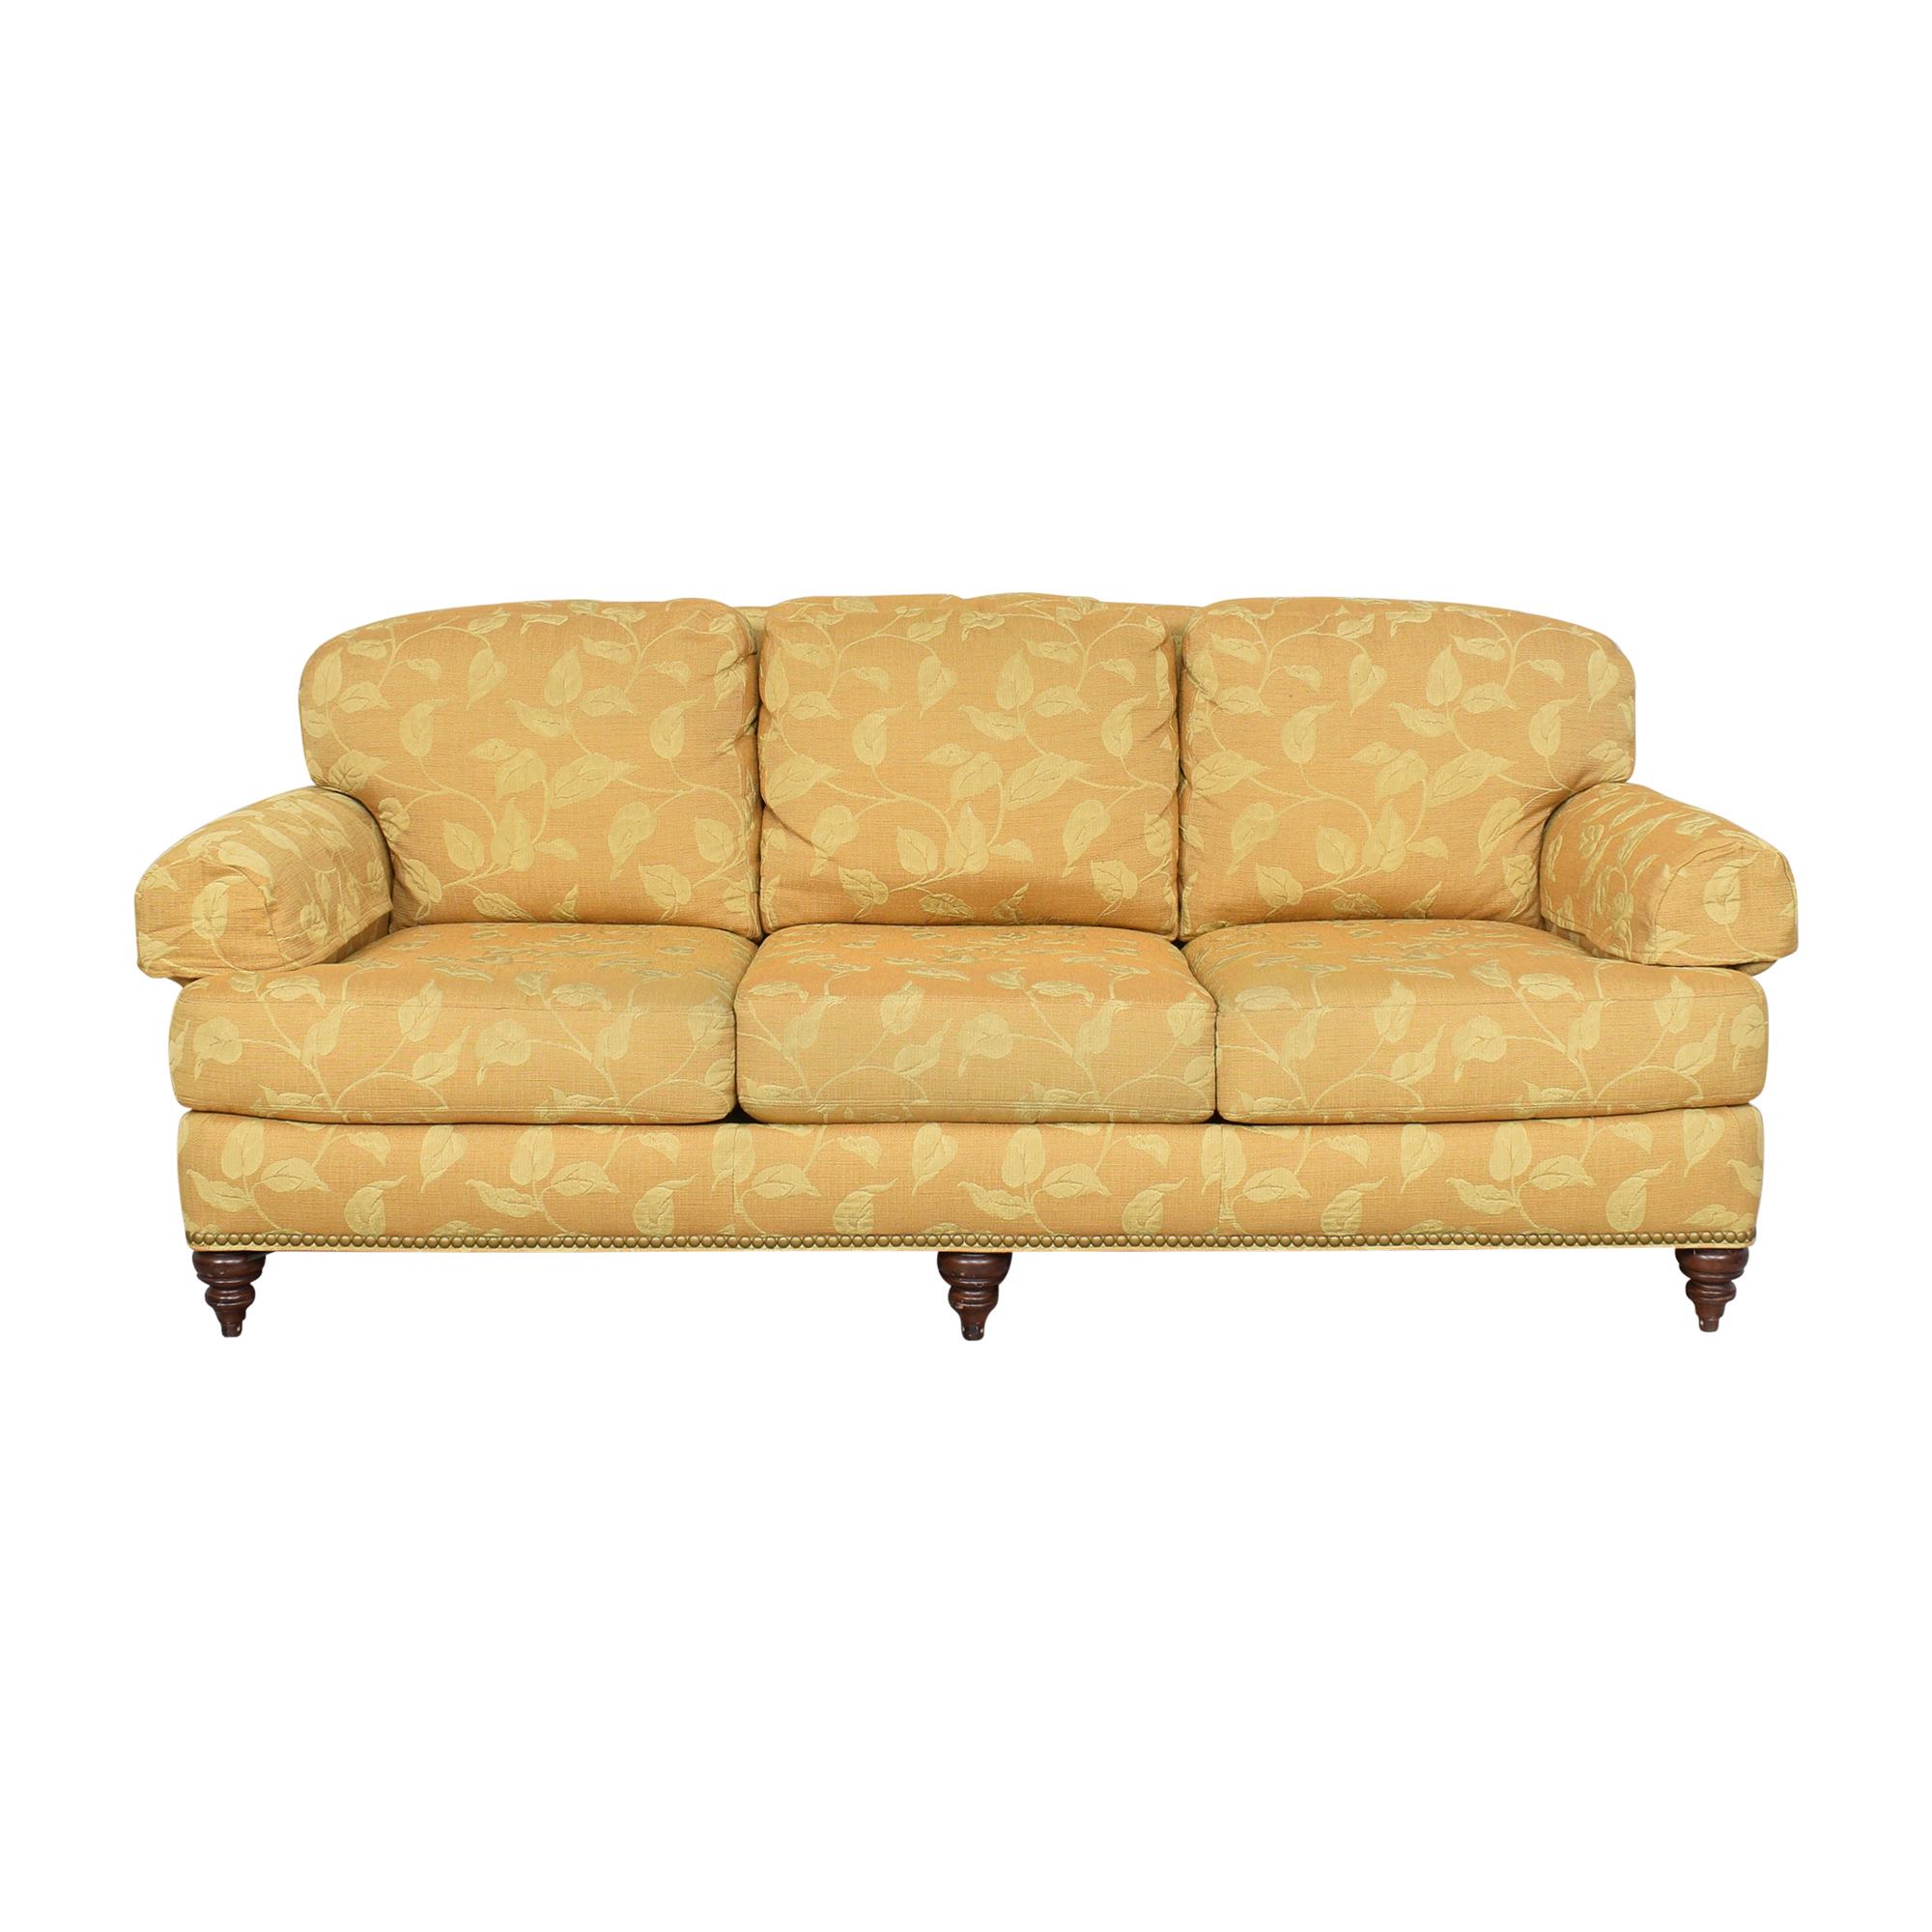 Sherrill Furniture Sherrill Nailhead Sofa second hand